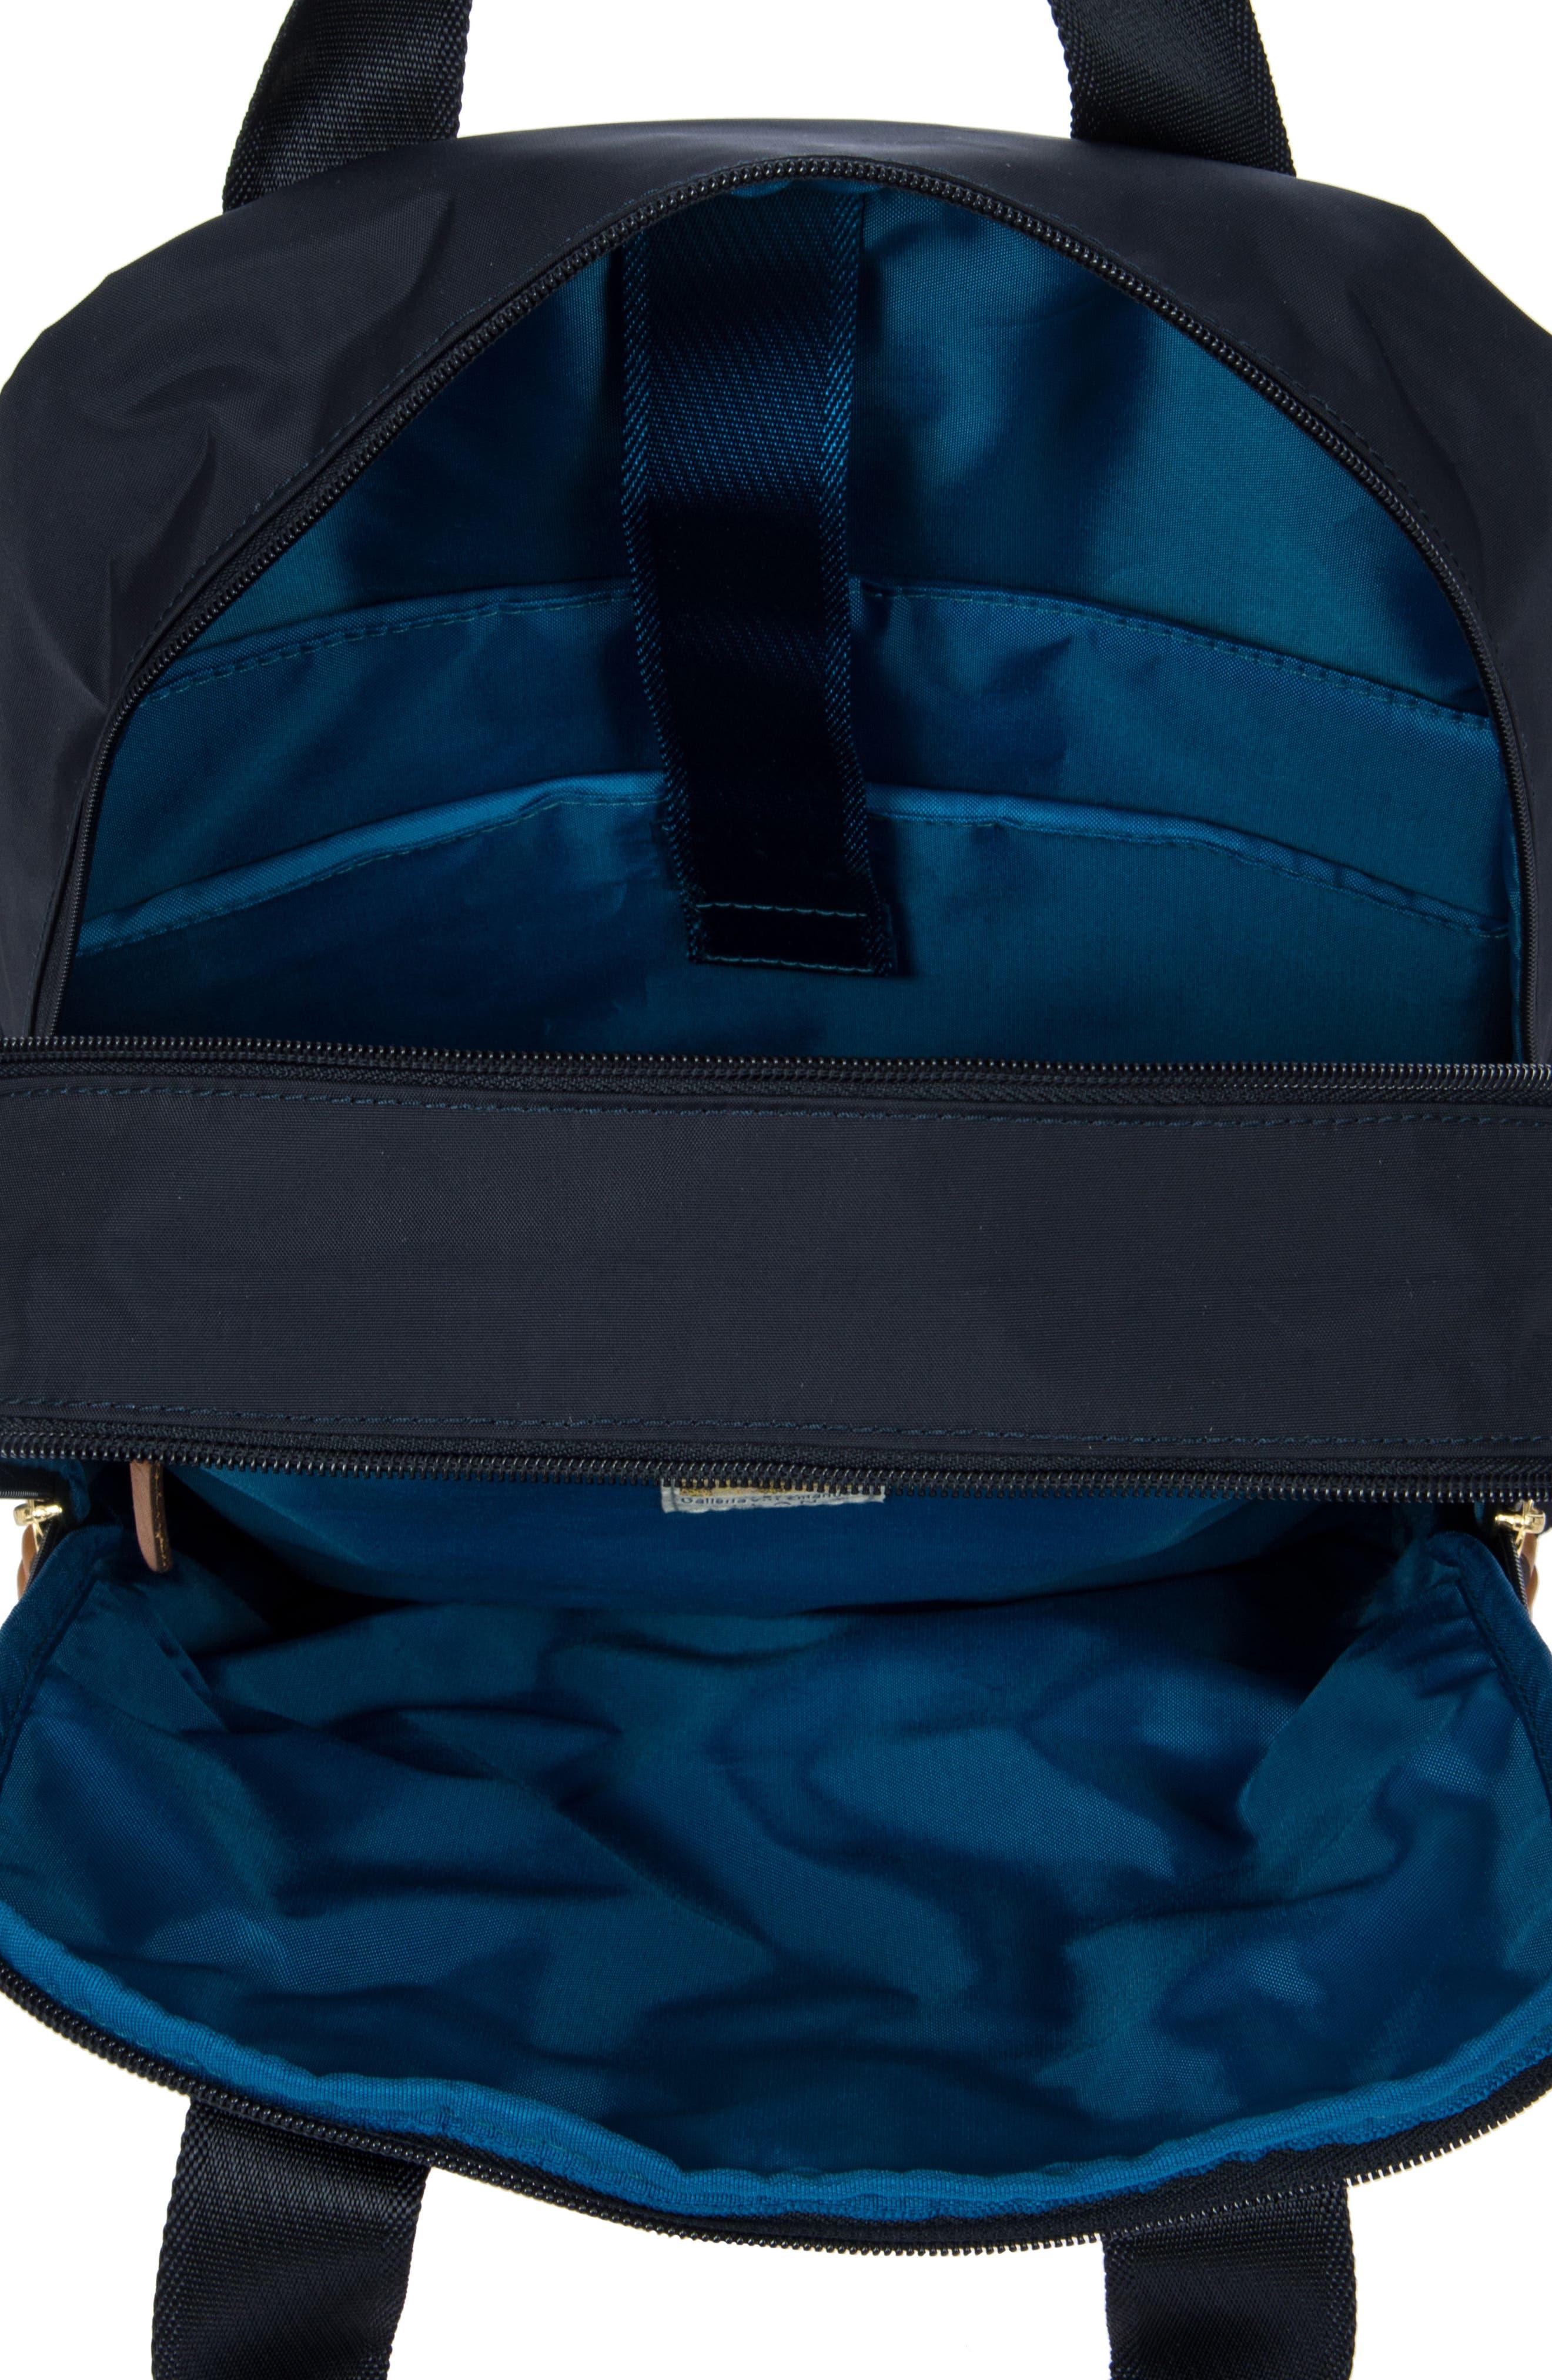 X-Bag Travel Urban Backpack,                             Alternate thumbnail 3, color,                             Navy